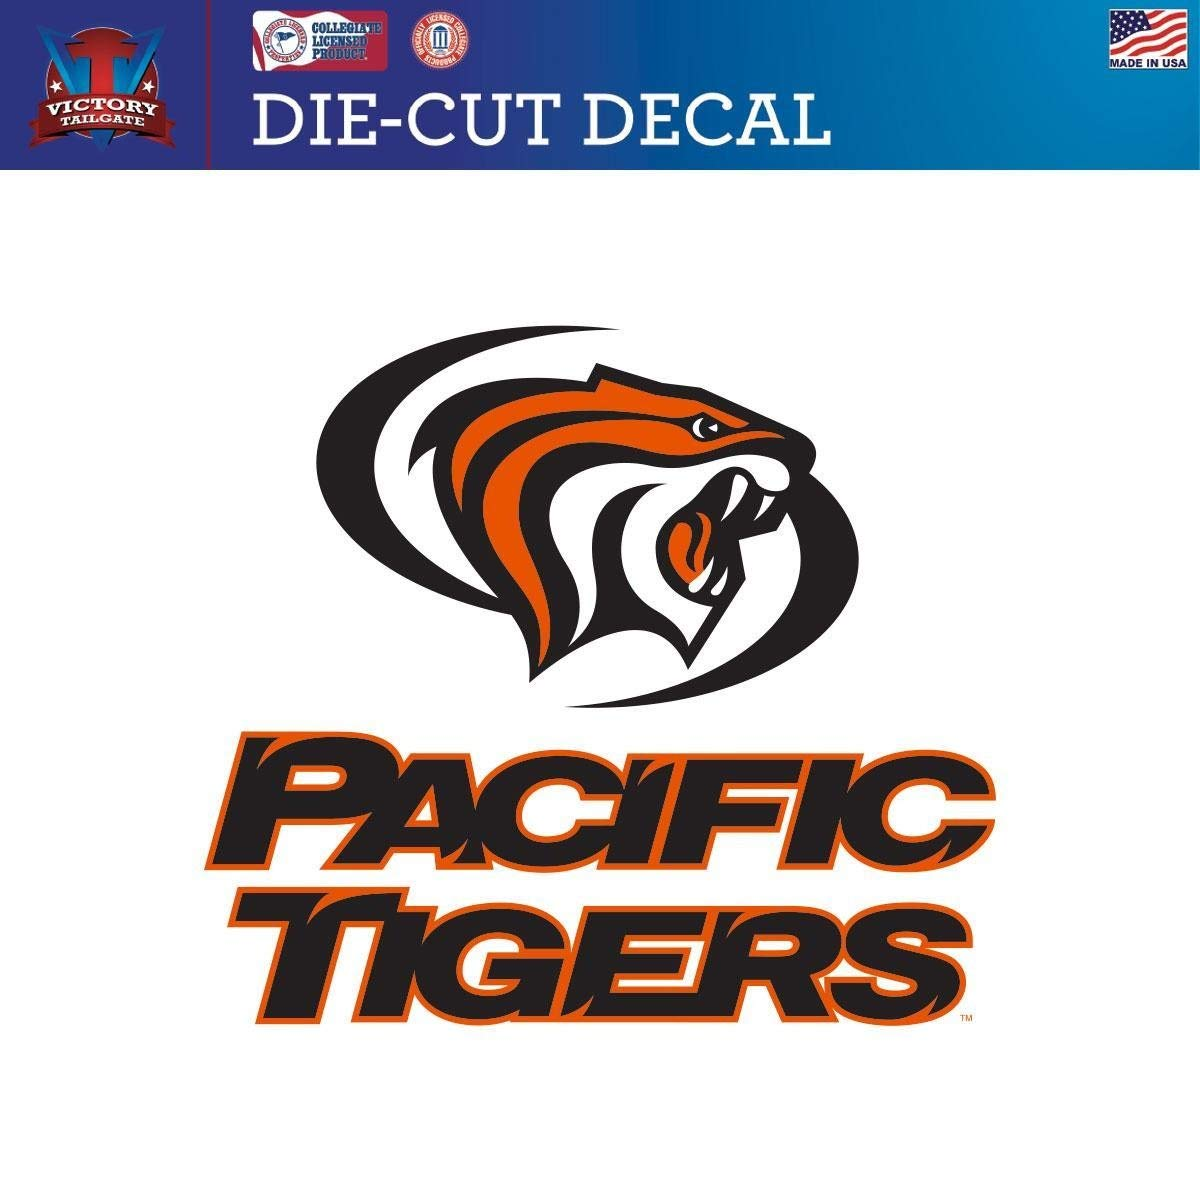 Victory Tailgate Pacific Tigers Die-Cut Vinyl Decal